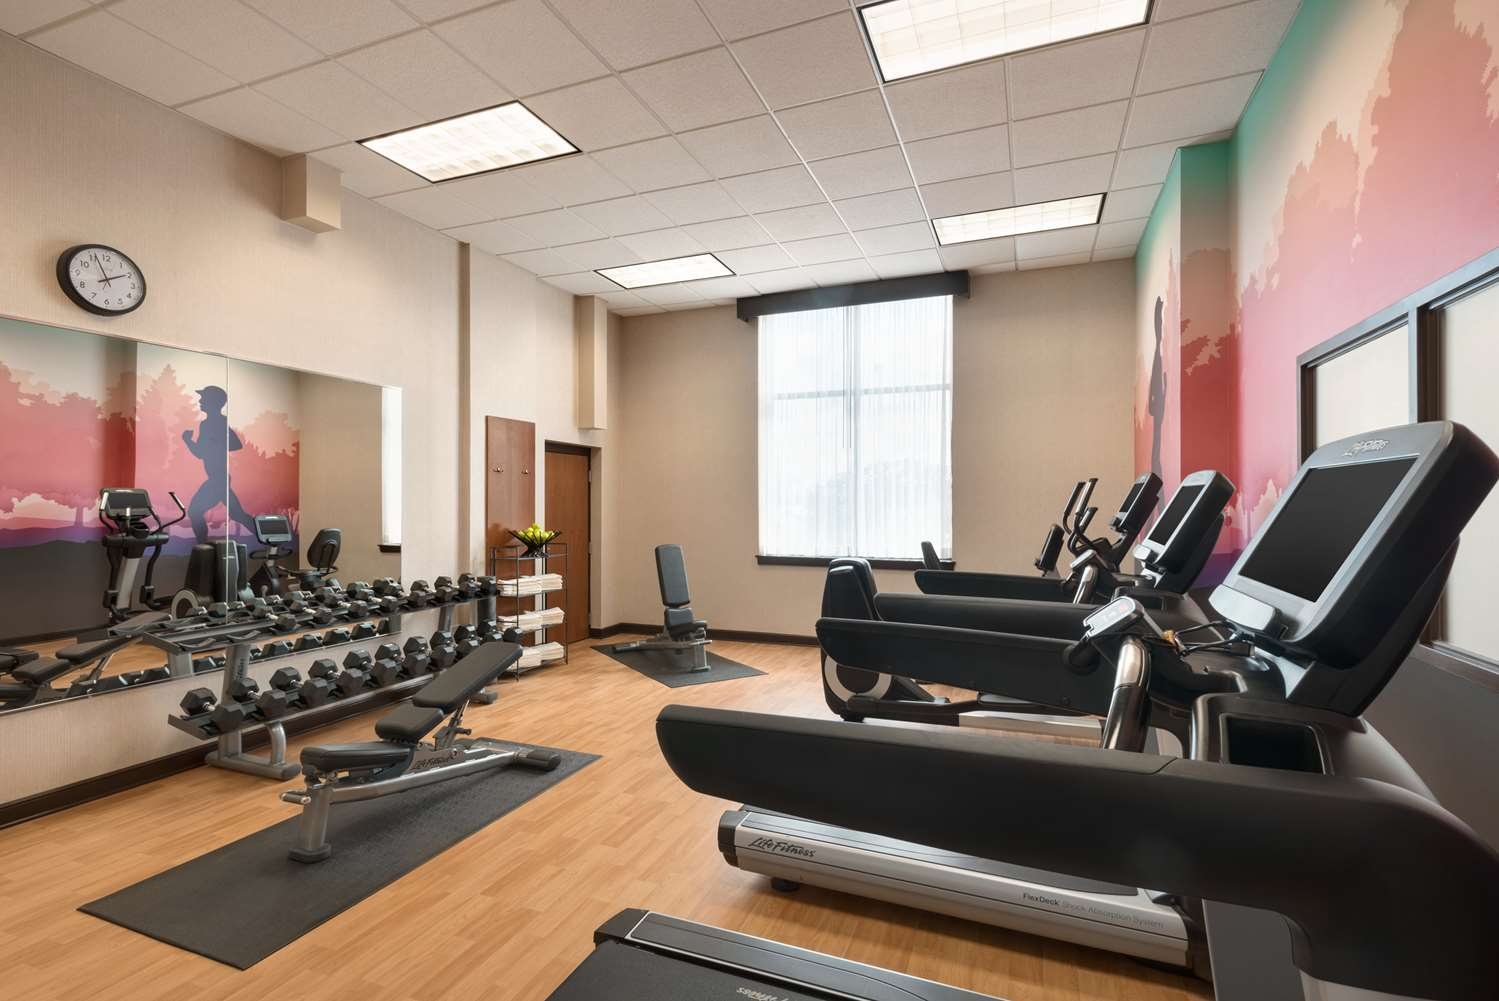 Fitness/ Exercise Room - Hyatt Place Hotel Schaumburg